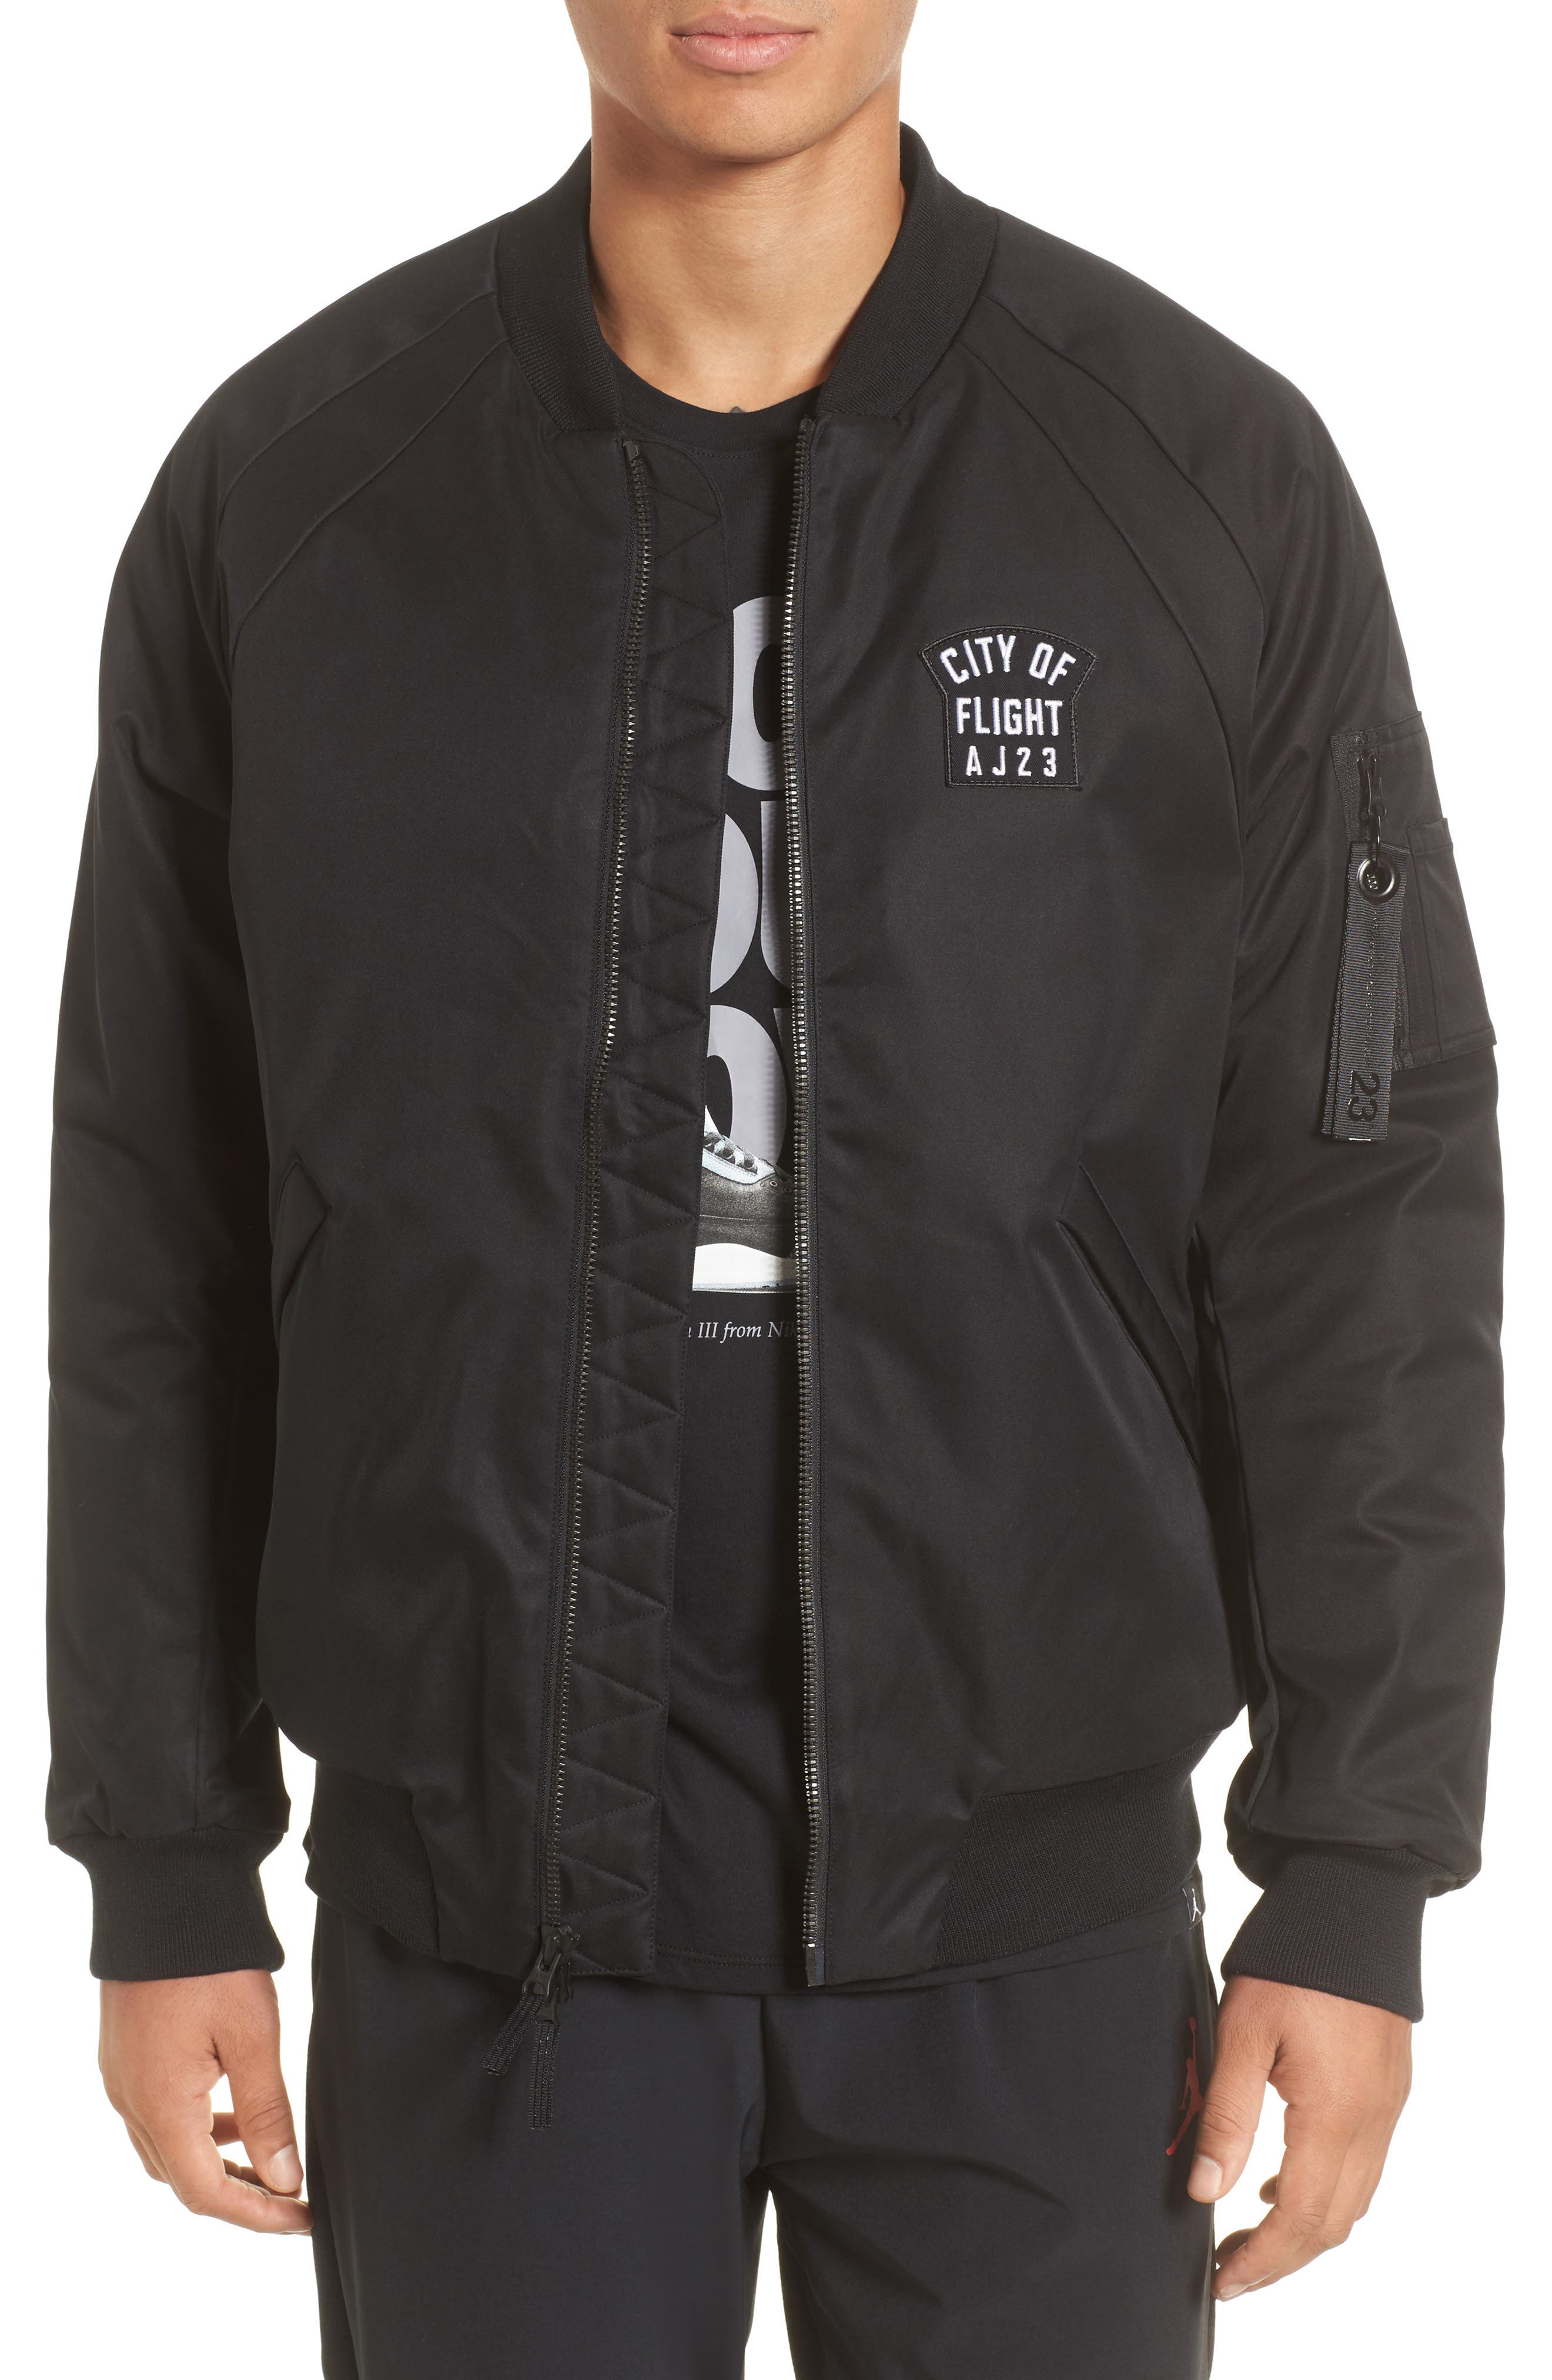 Main Image - Nike Jordan Sportswear City of Flight MA-1 Bomber Jacket